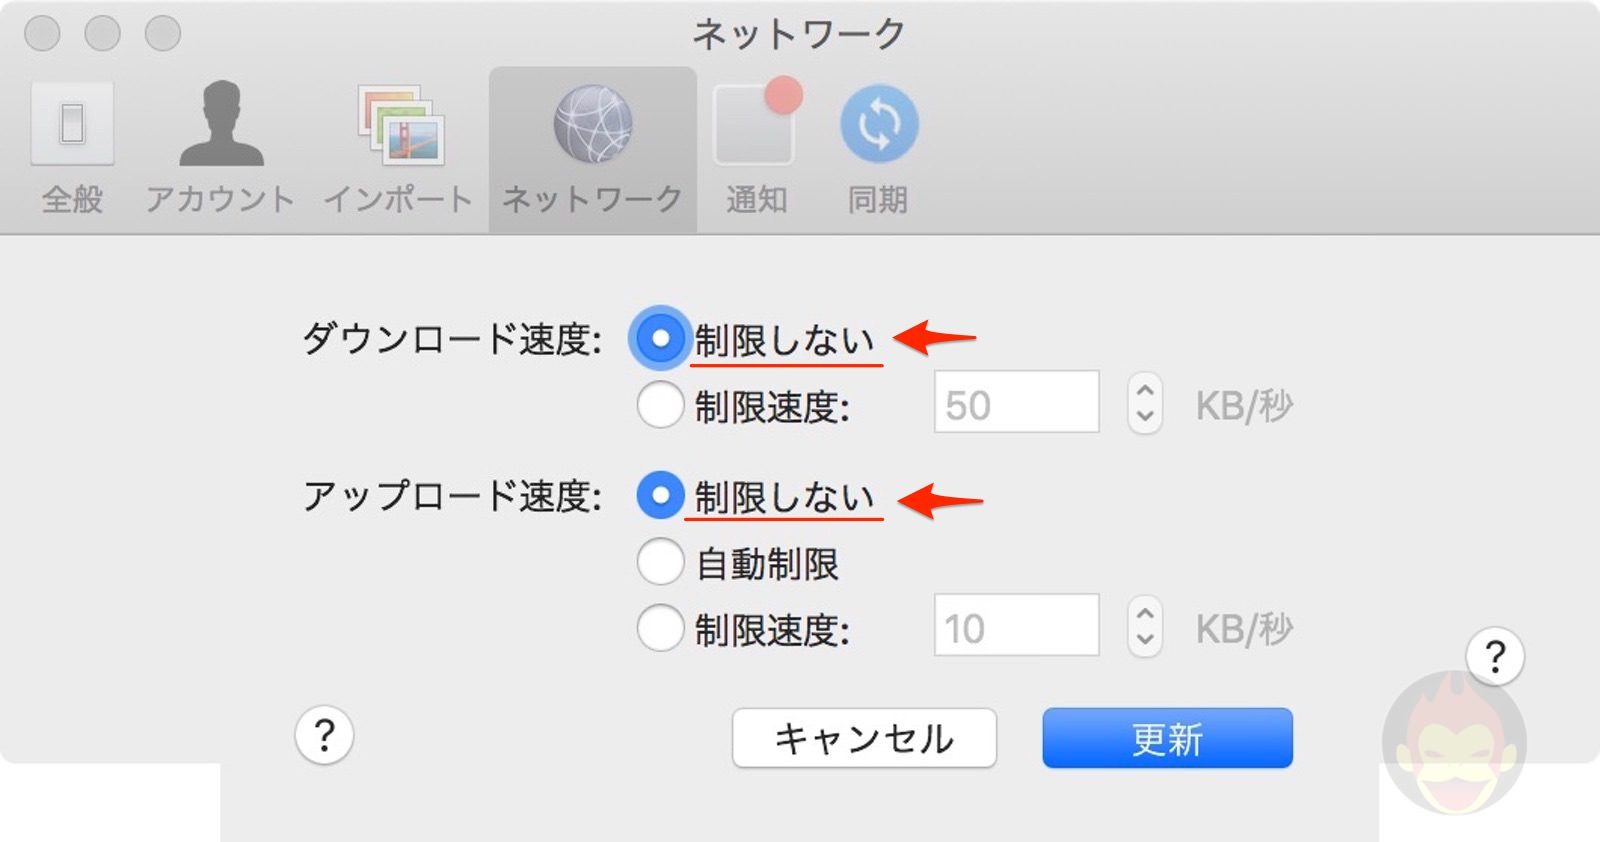 speeding-up-upload-speeds-on-dropbox-02-2